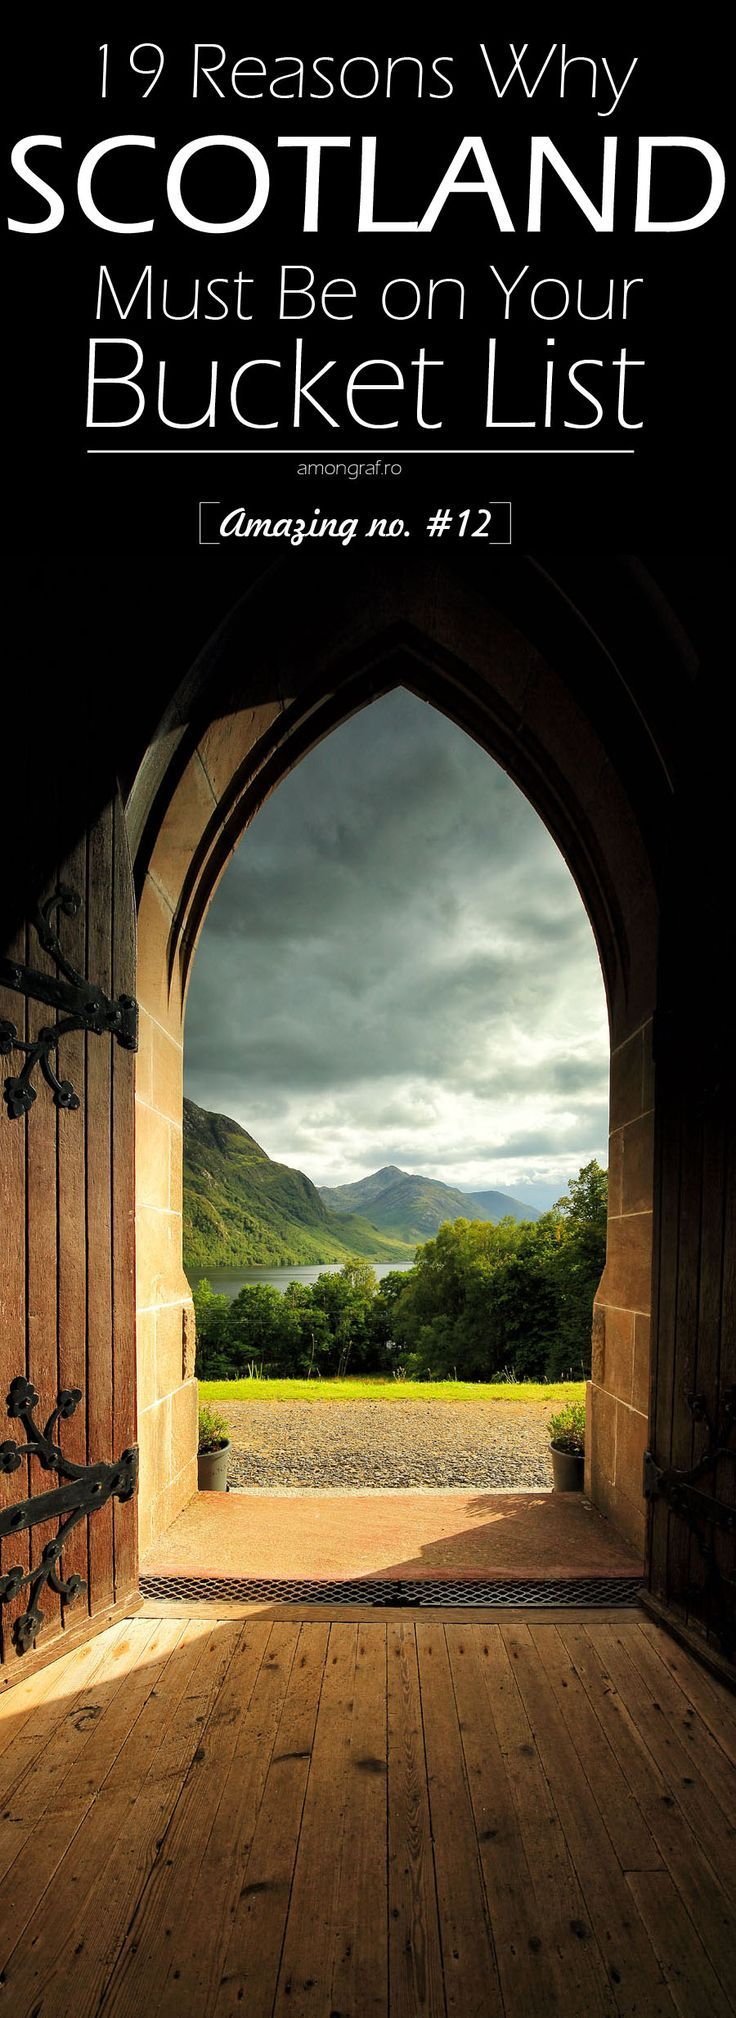 19 Reasons Why Scotland Must Be on Your Bucket List. Amazing no. #12 #Scotland (scheduled via http://www.tailwindapp.com?utm_source=pinterest&utm_medium=twpin&utm_content=post22279526&utm_campaign=scheduler_attribution)